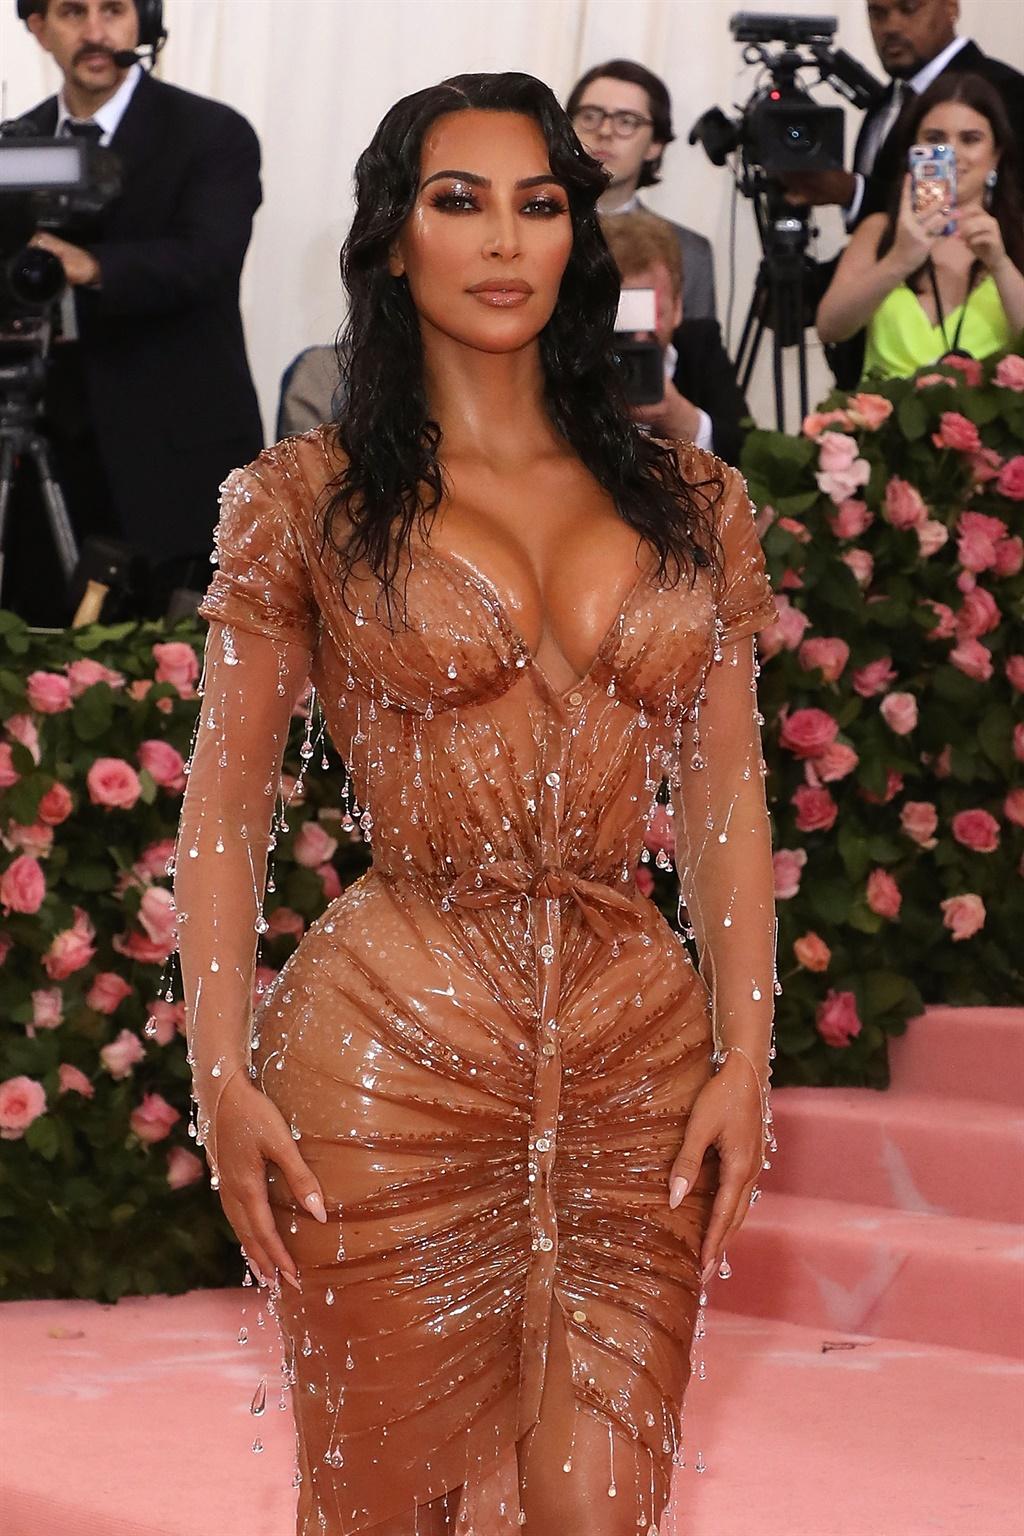 NEW YORK, NY - MAY 06: Kim Kardashian West attend